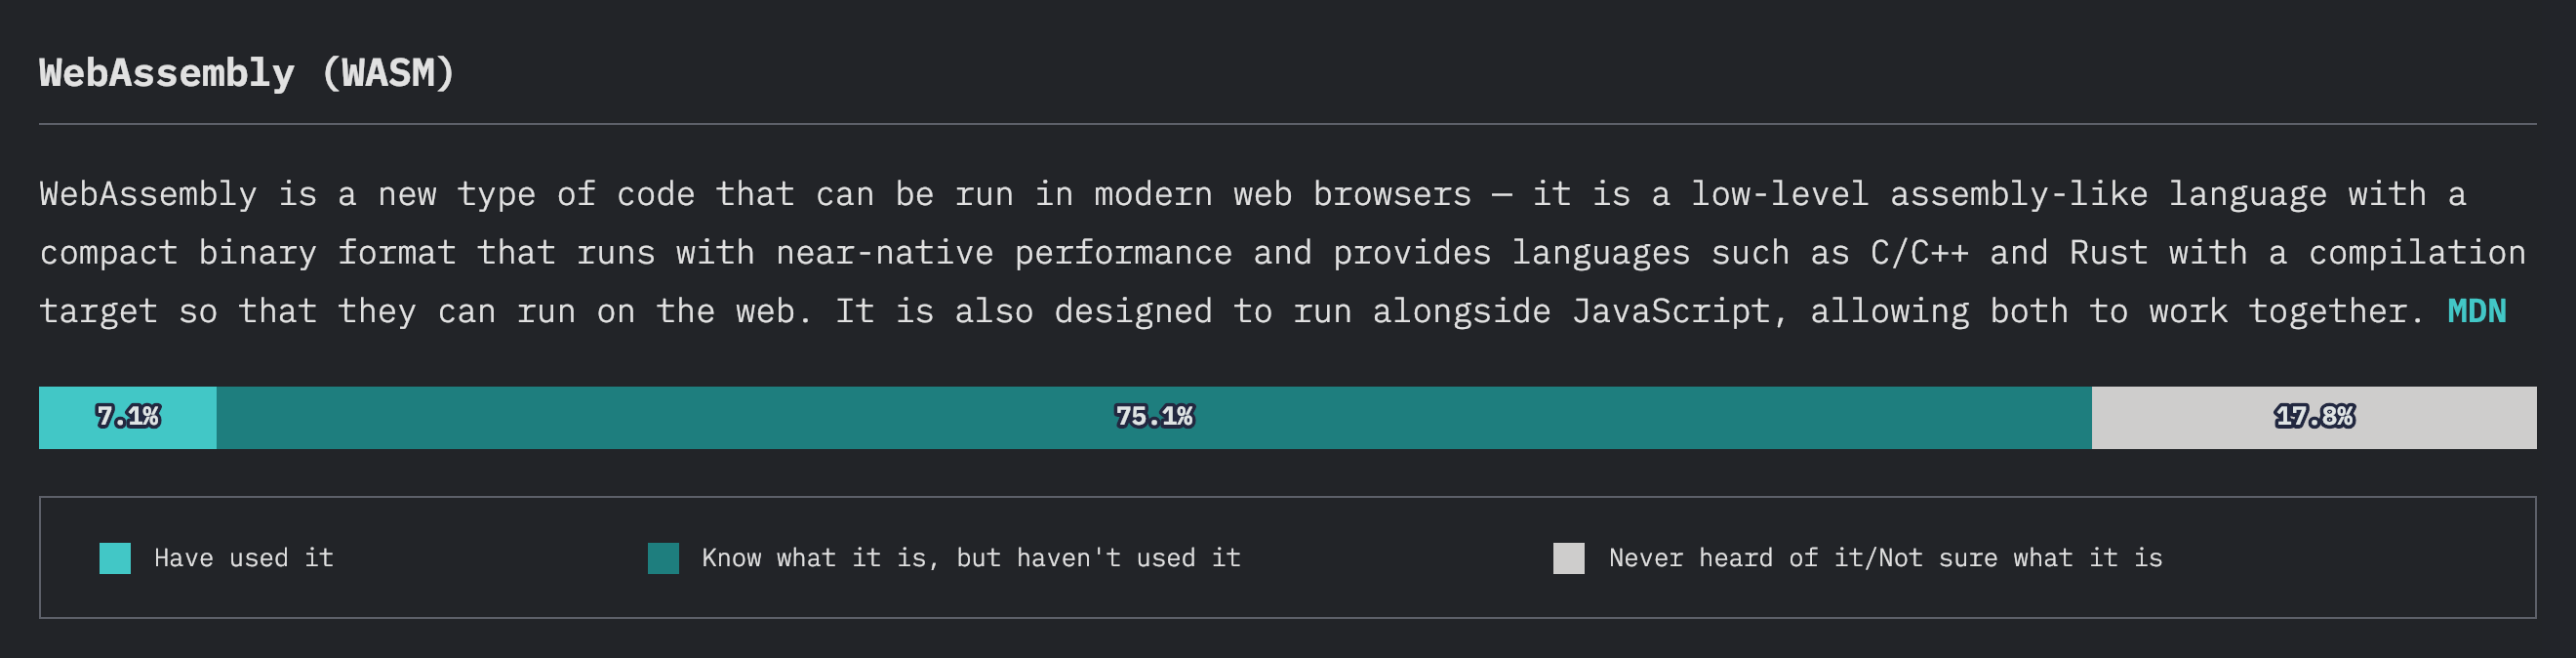 WebAssembly Usage